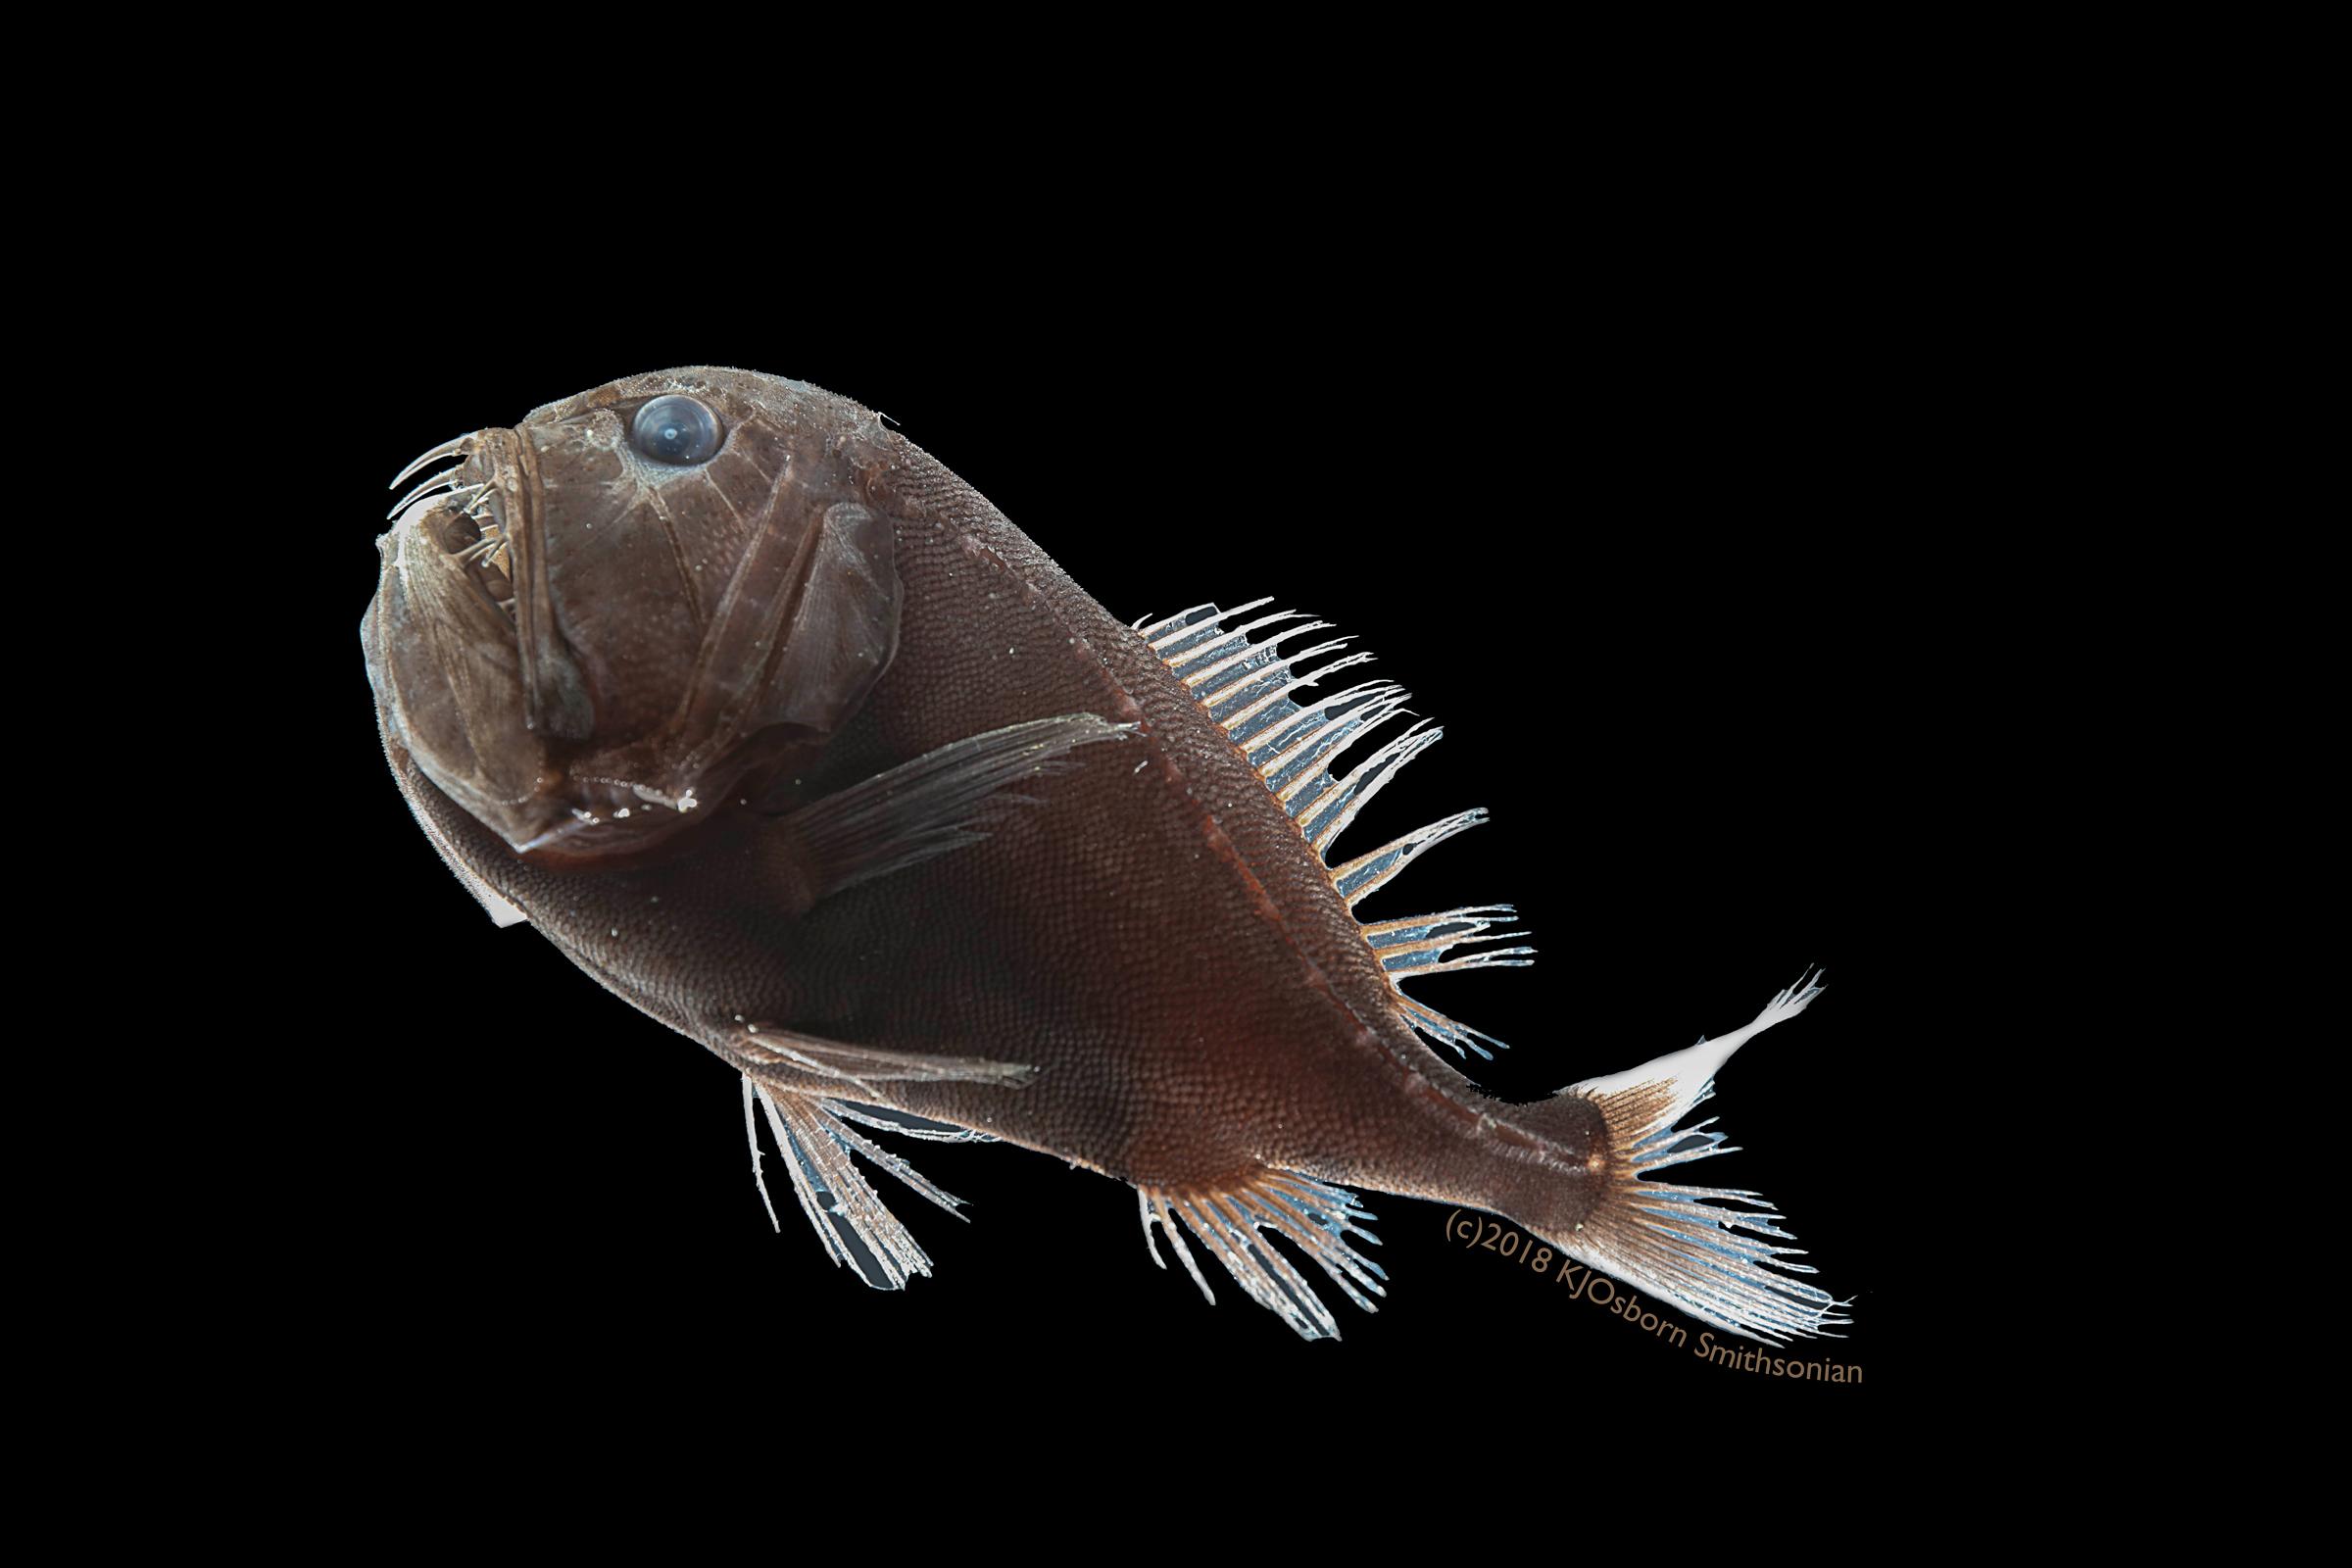 Anoplogaster cornuta